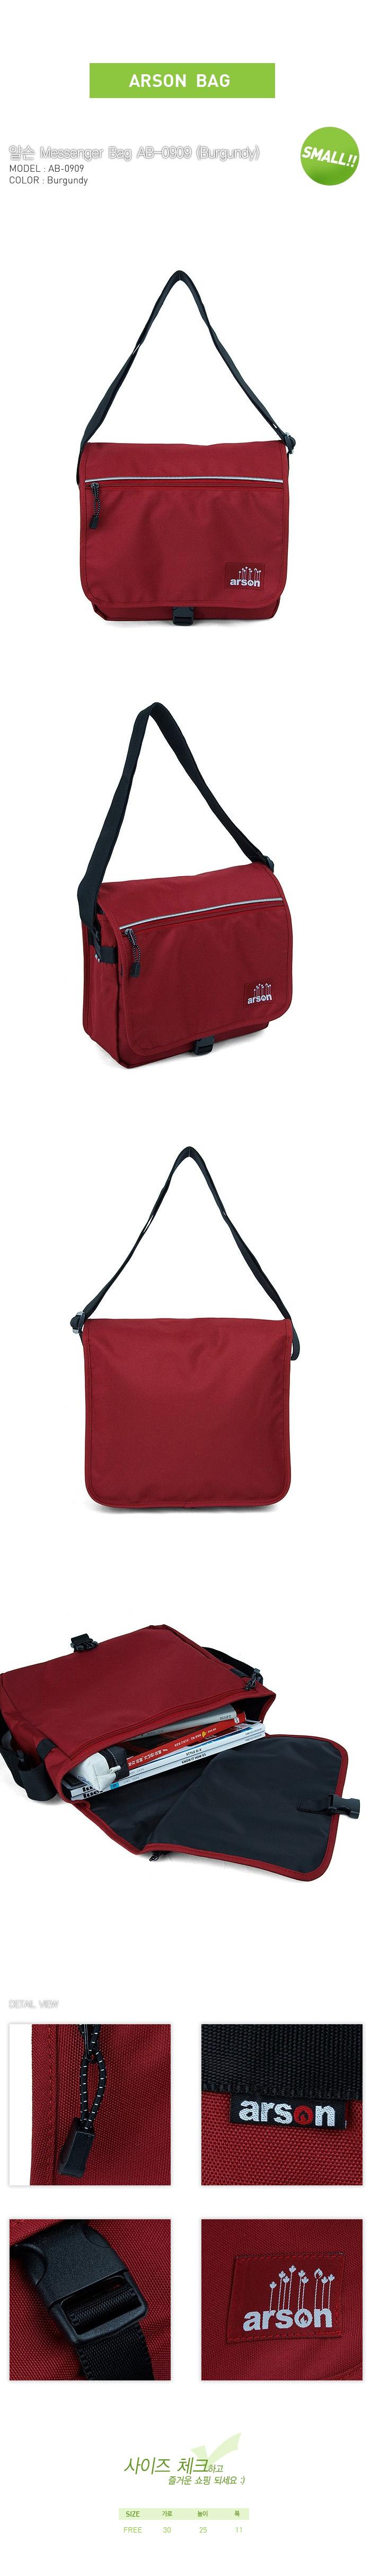 [ ARSON ] AB-0909 (Burgundy)/Messenger Cross Bag